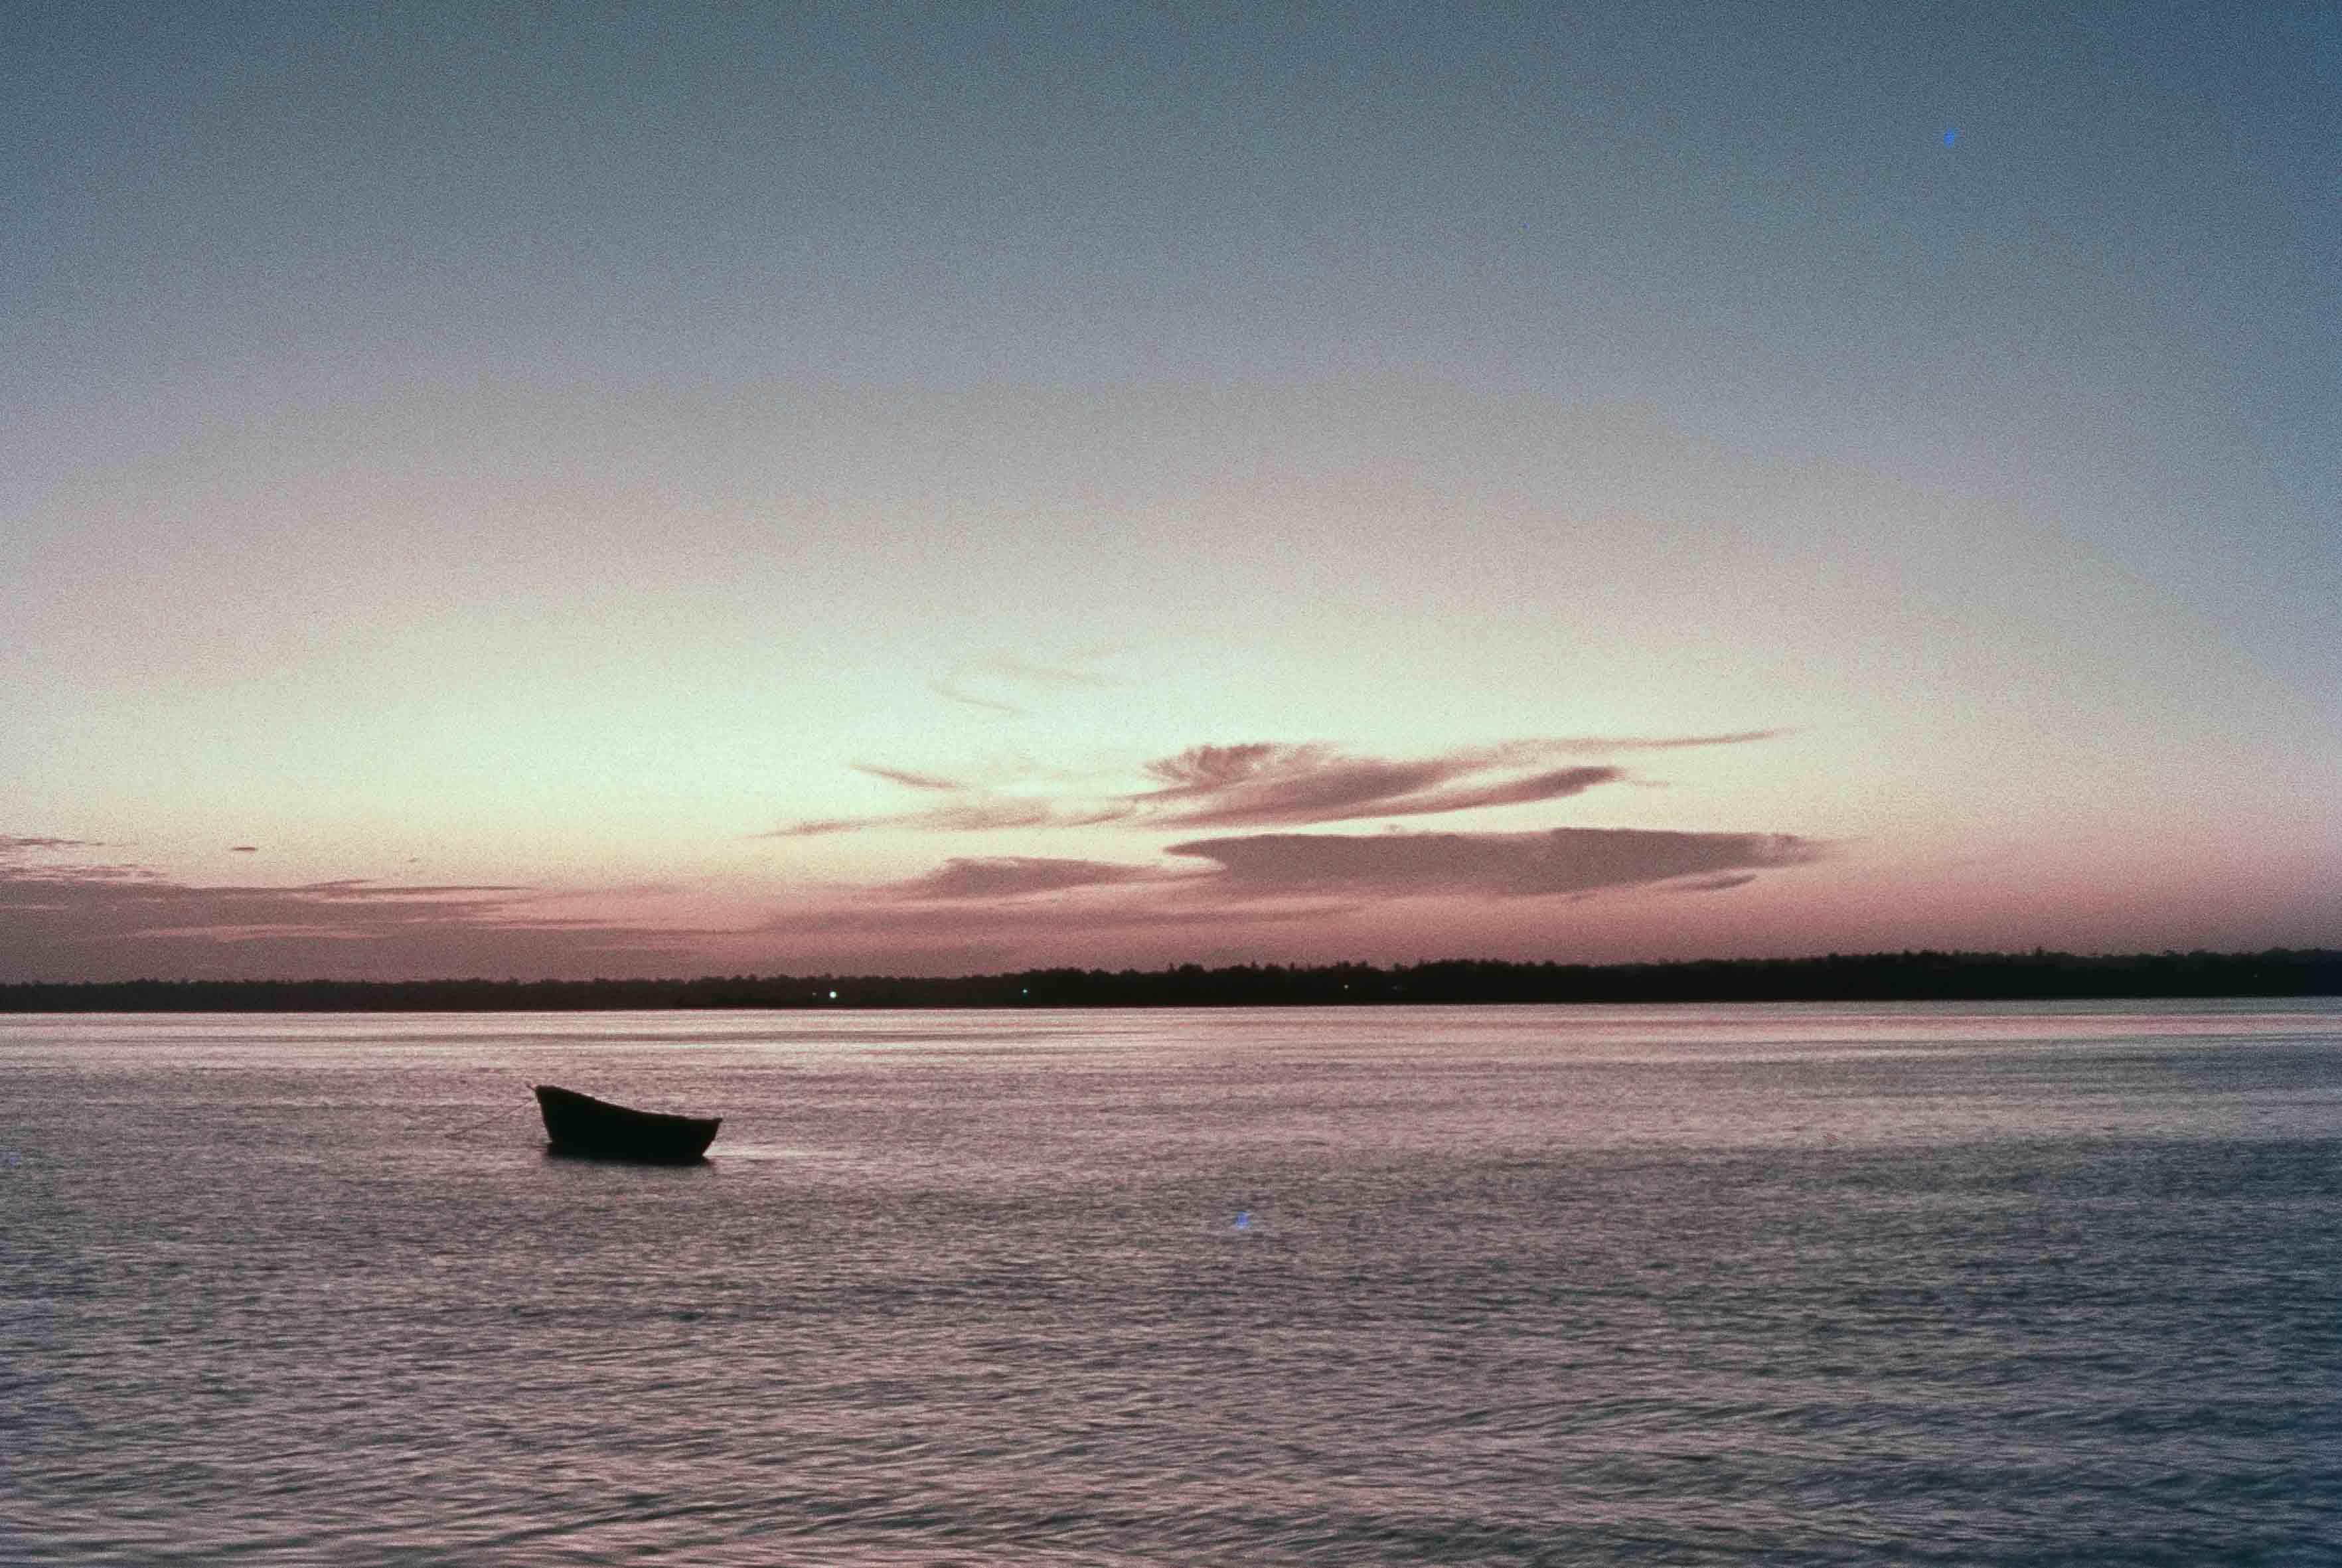 376. Suriname